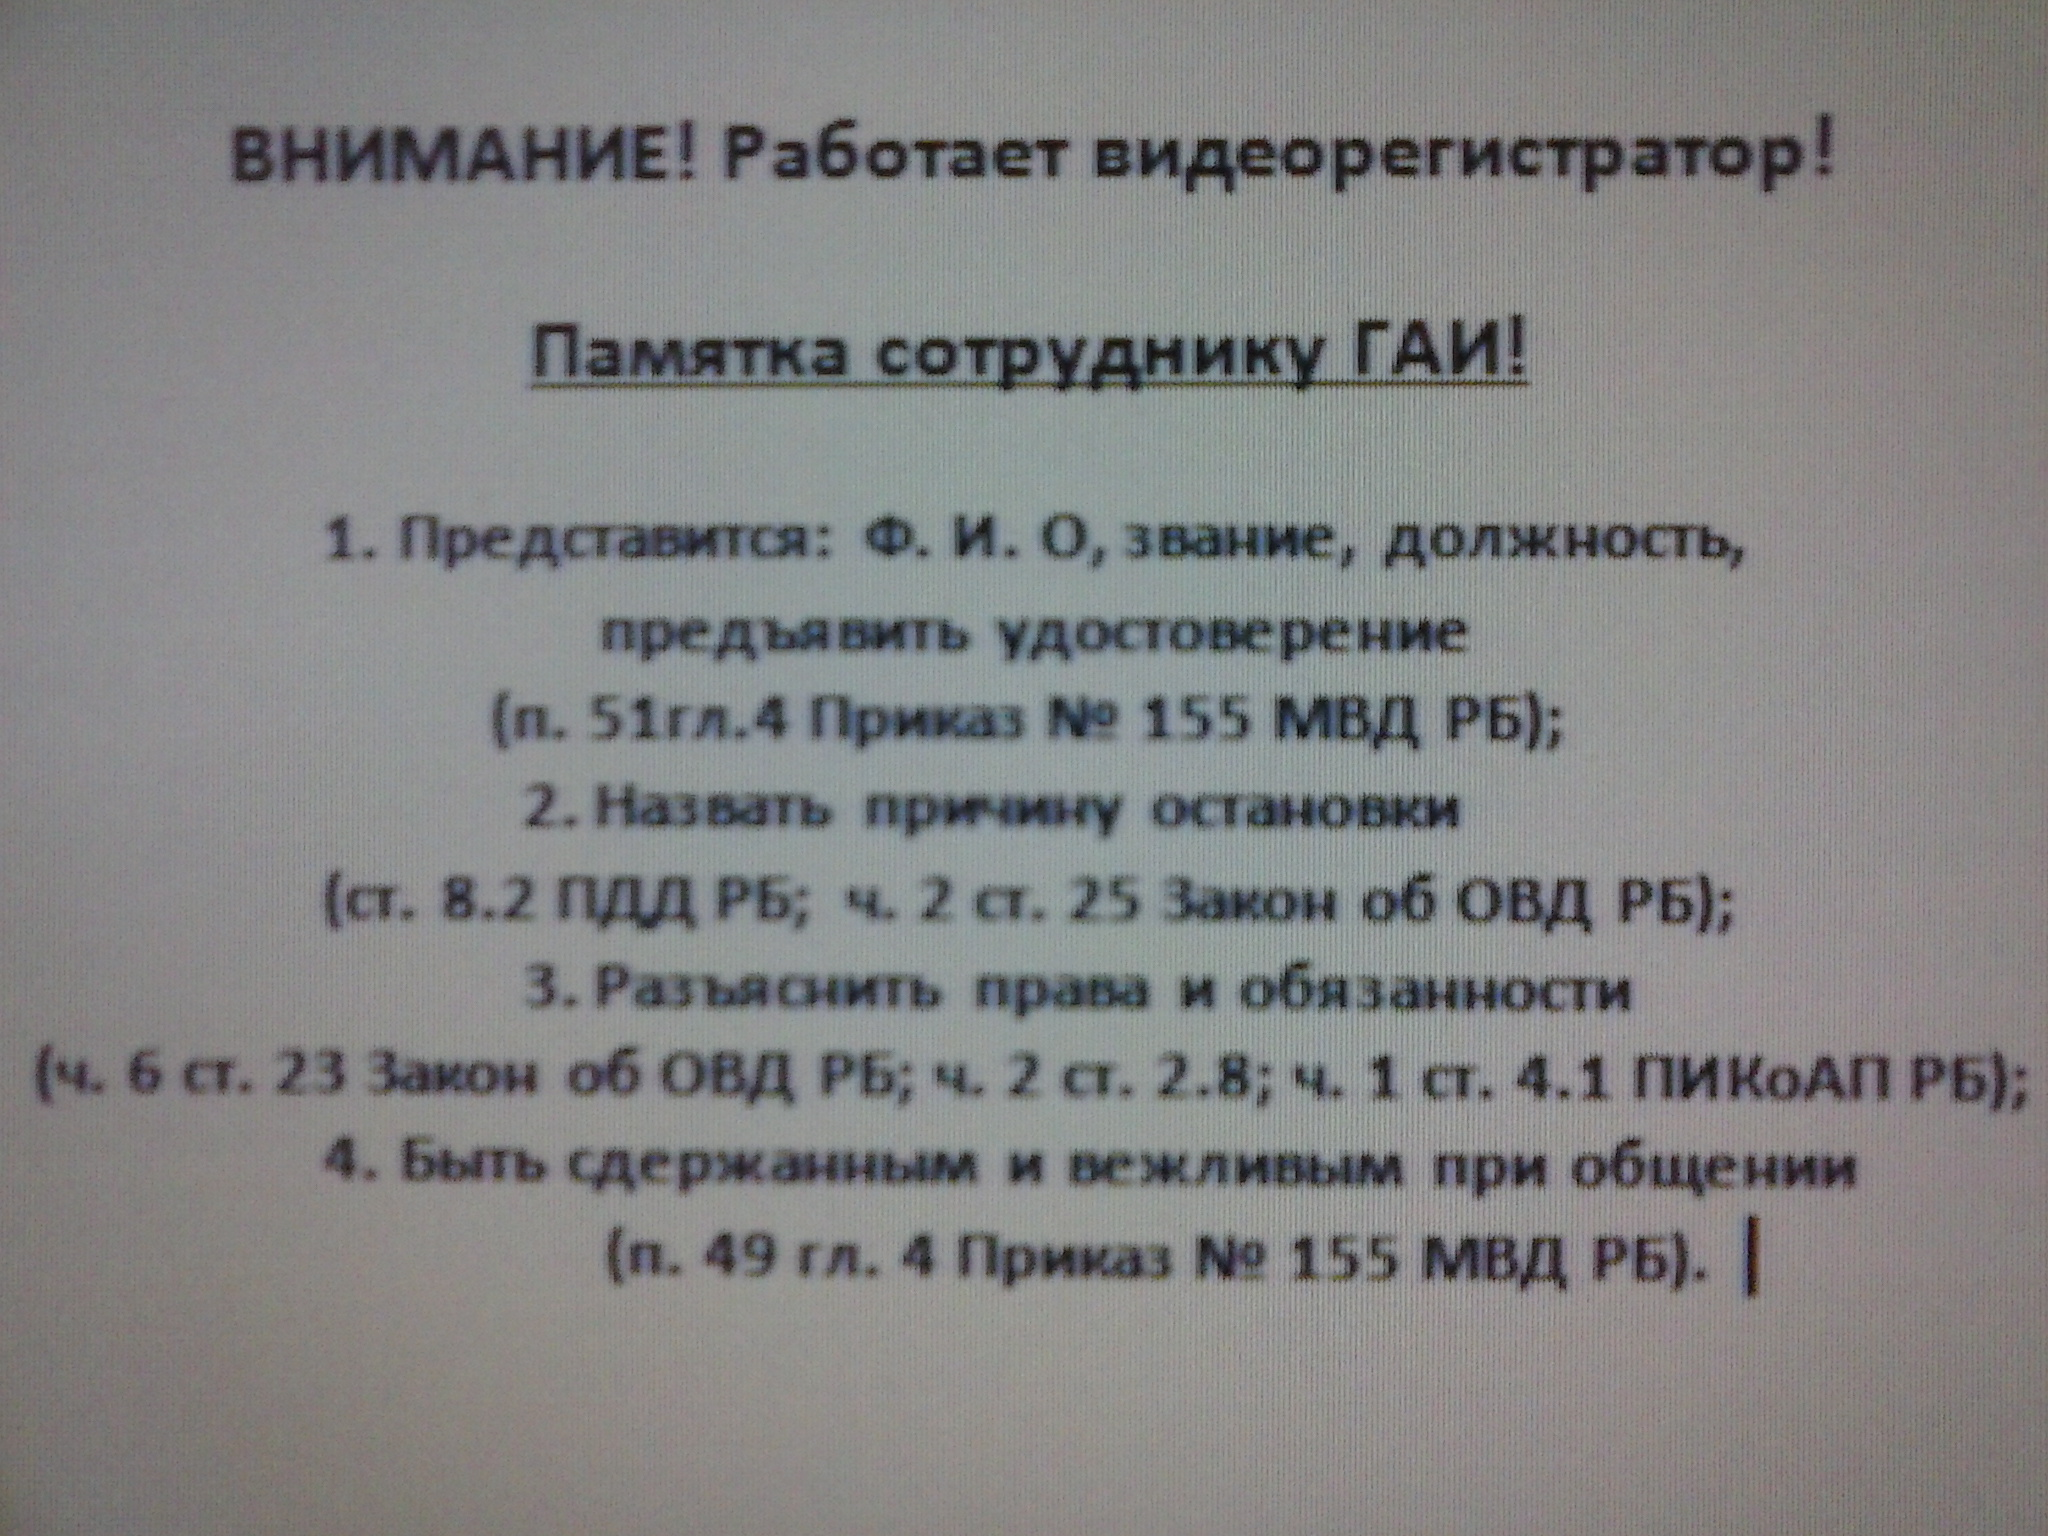 Памятка сотруднику ГАИ Беларусь